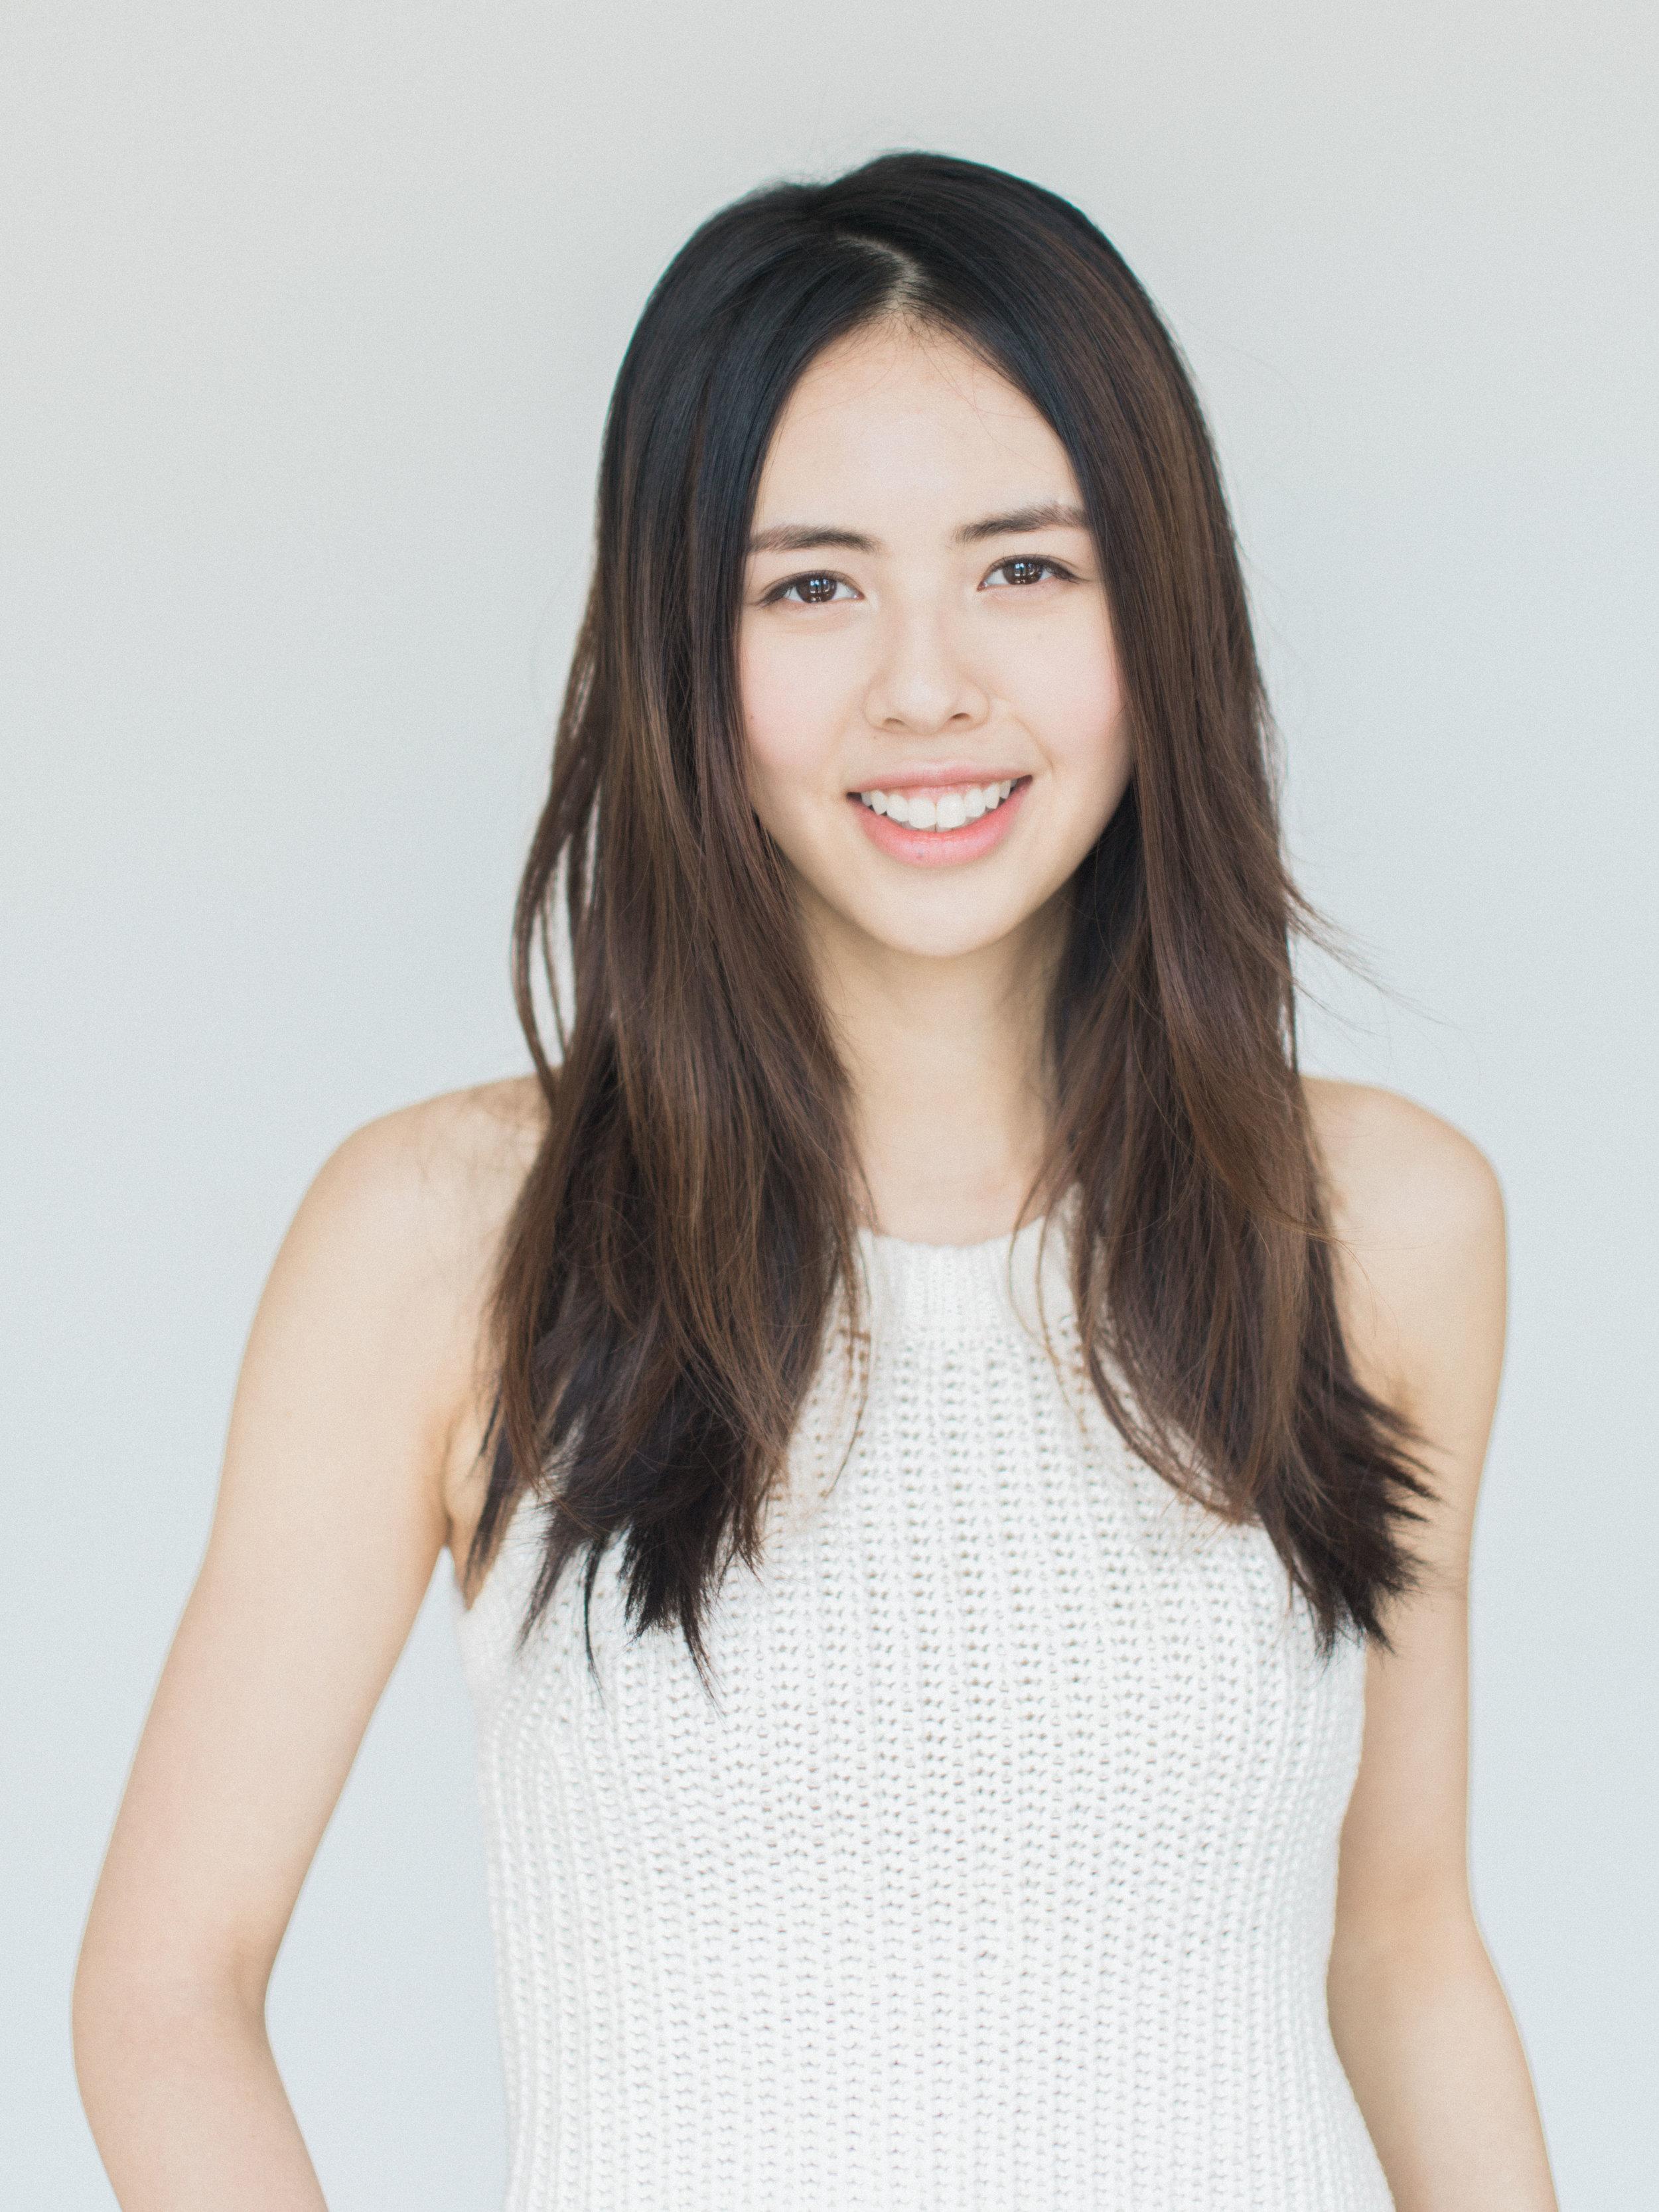 Tiana - Co-Founder of BeigeWeddings.co / Marketing Director